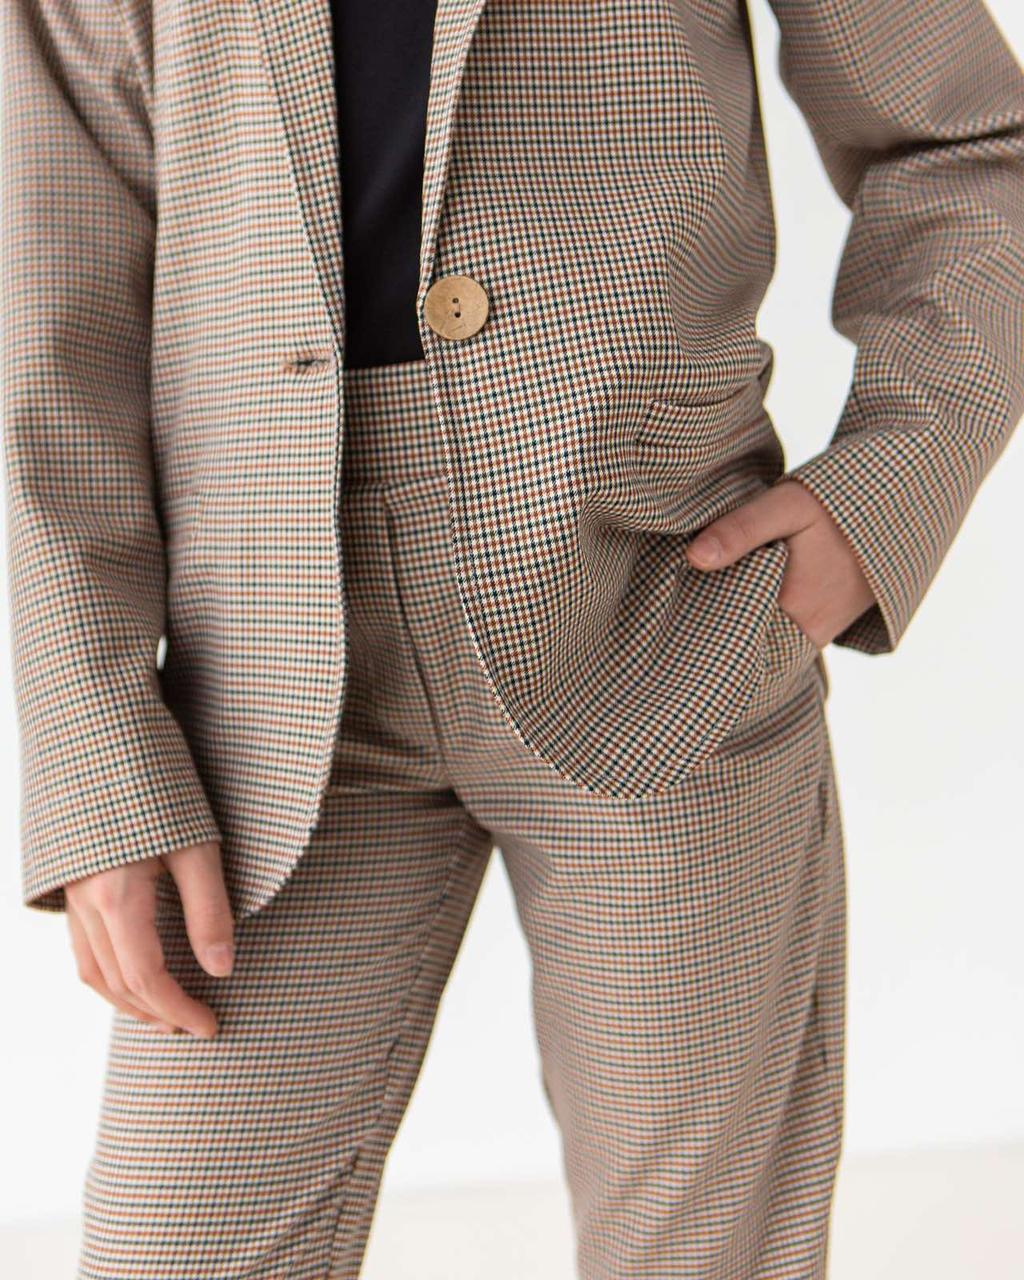 Костюм (жакет, брюки) для девочек Kidsmod 134  бежевый 981402